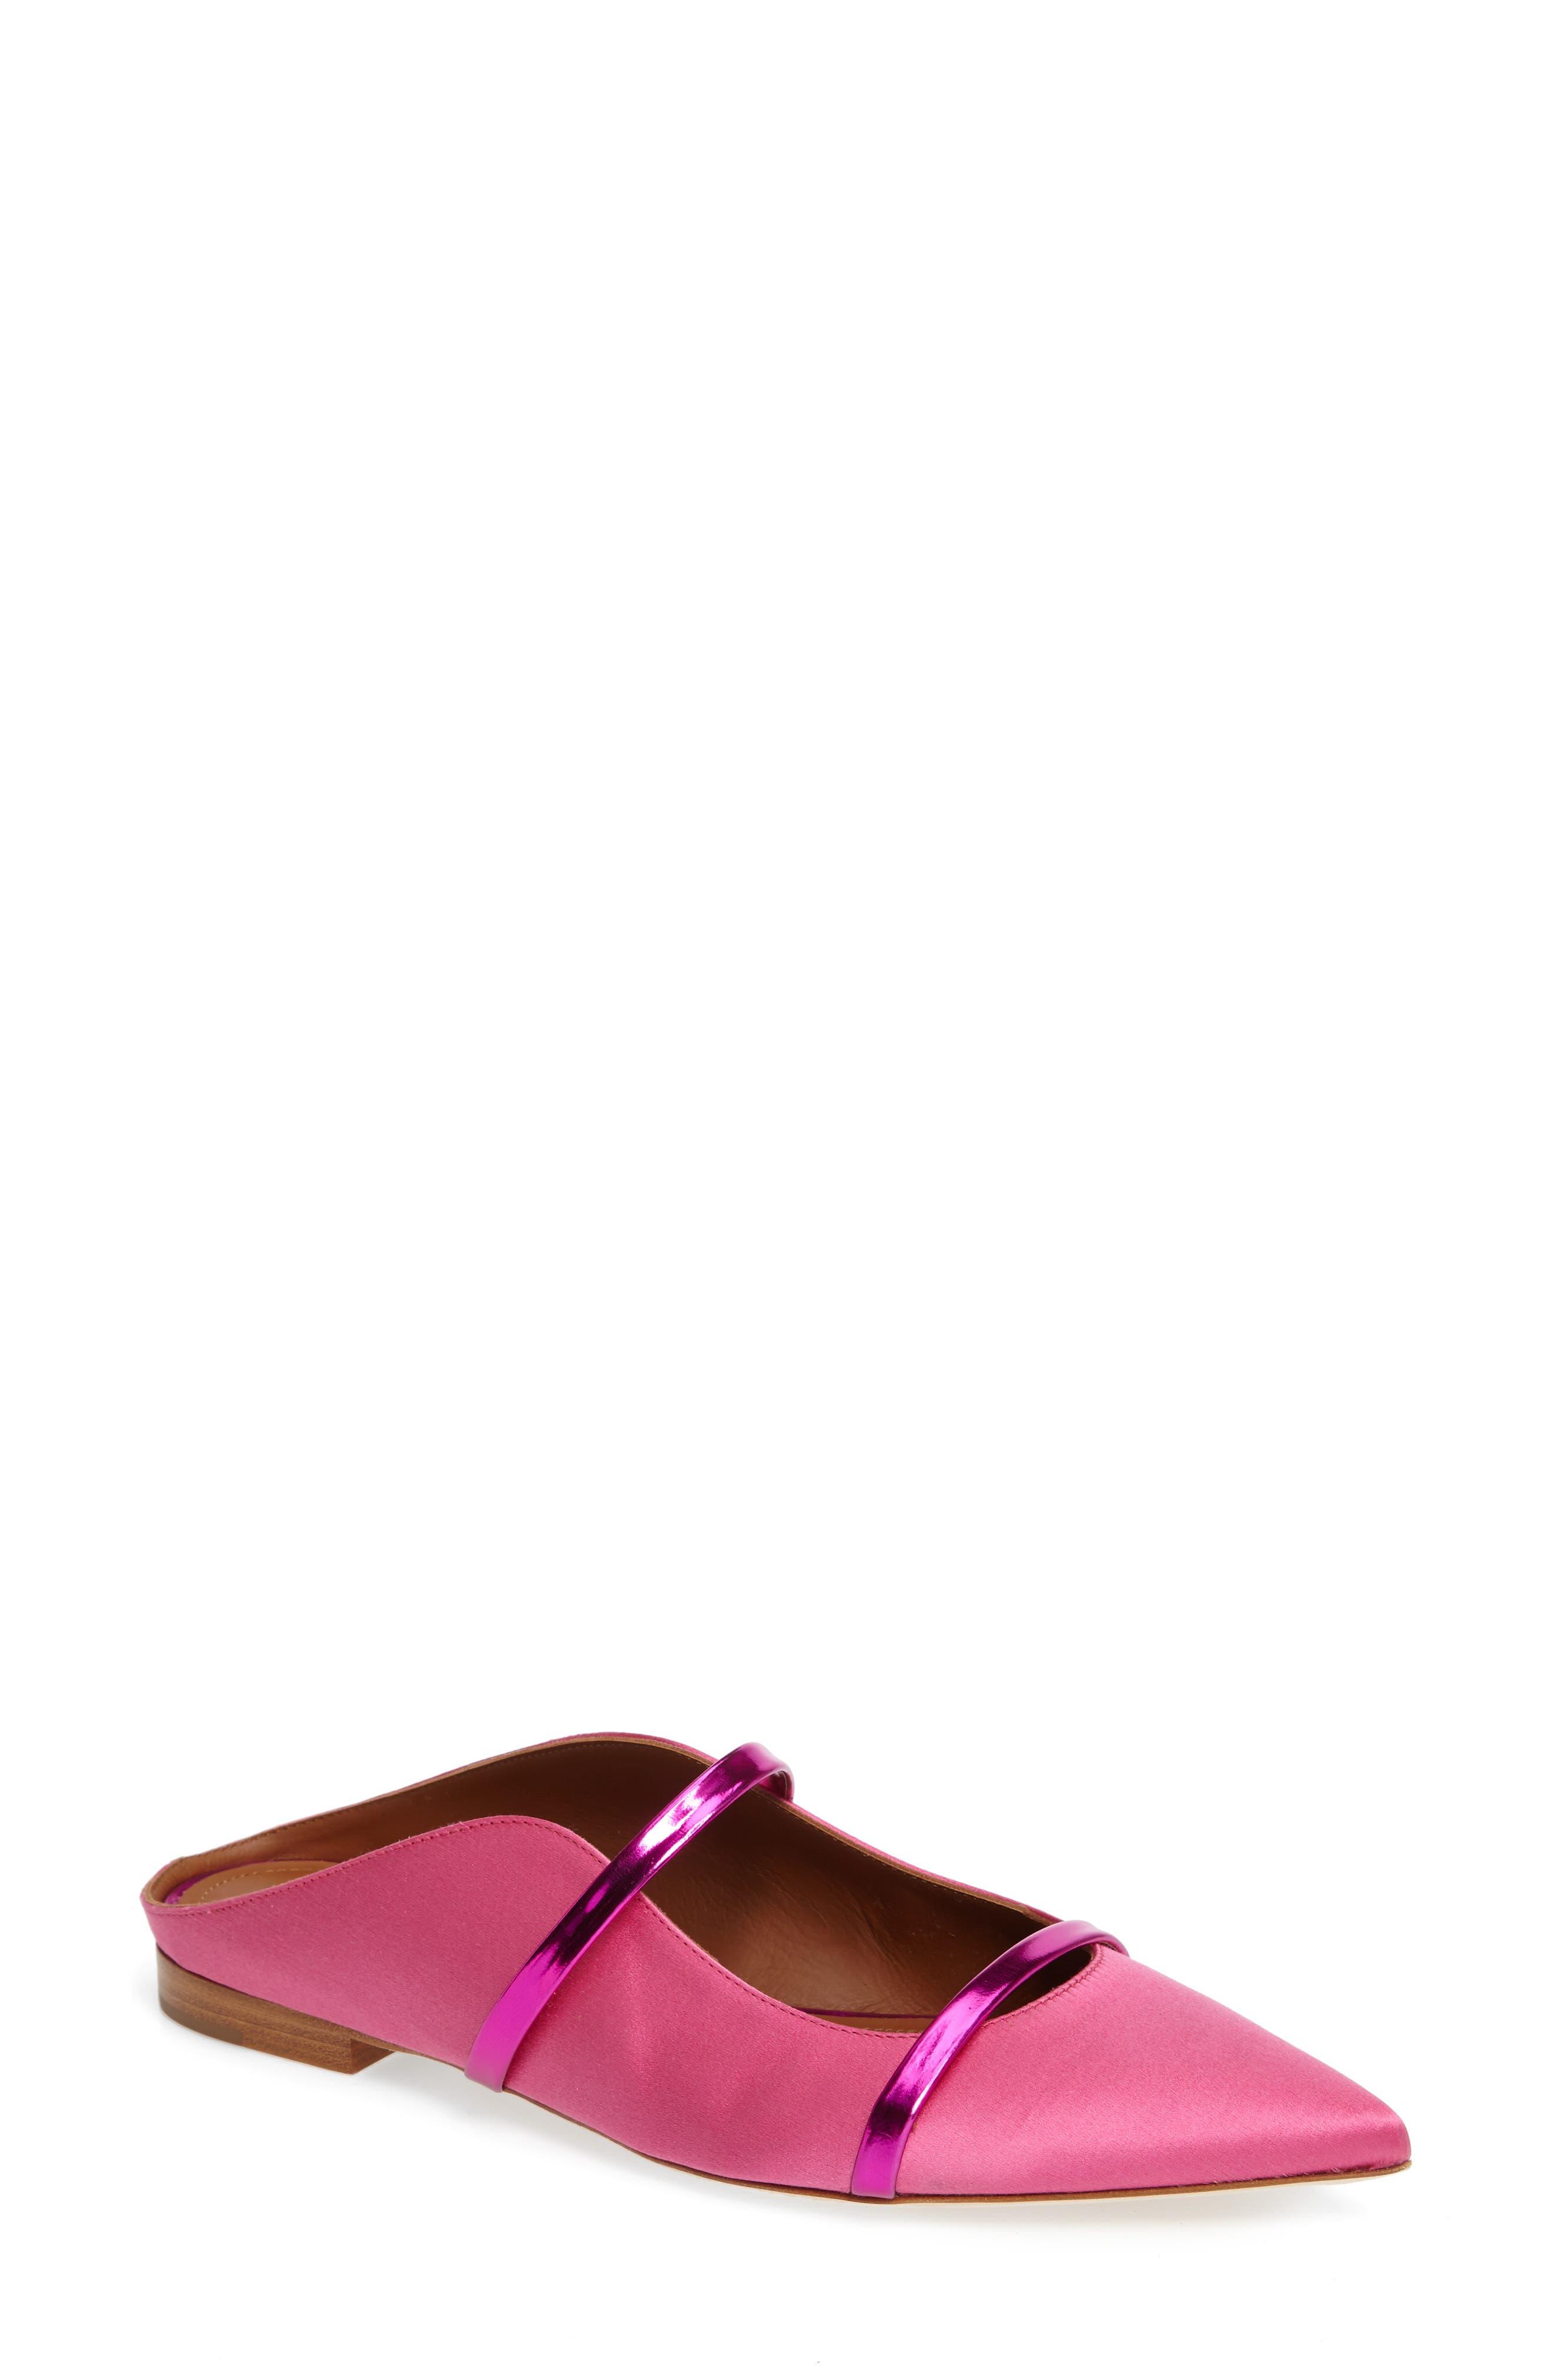 Maureen Pointy Toe Flat,                             Main thumbnail 1, color,                             650